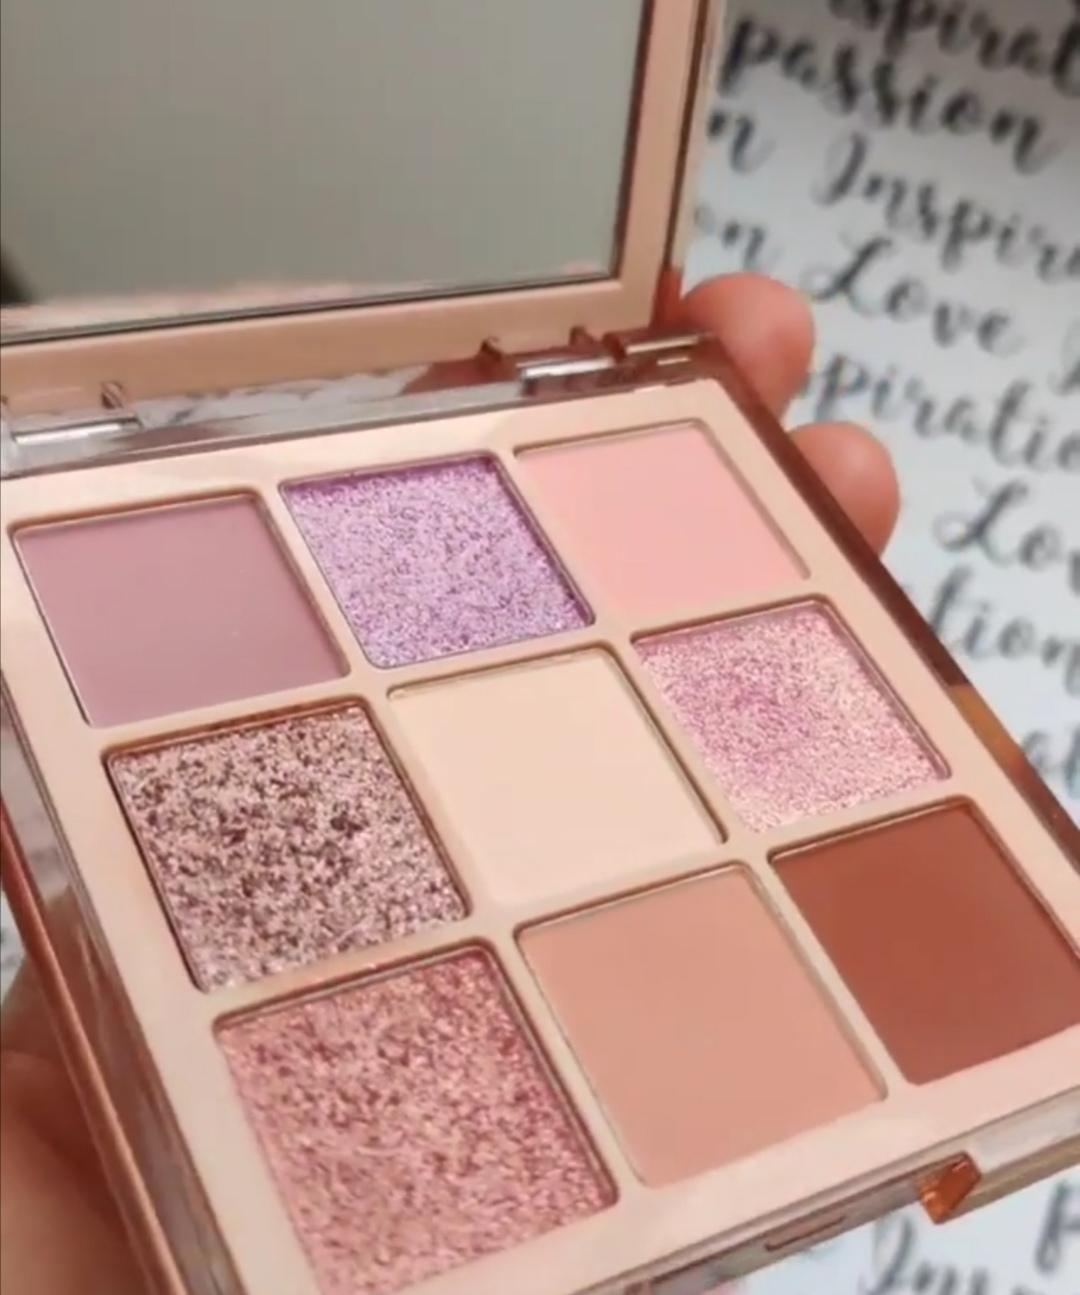 Huda Beauty Nude (Light) Obsessions Eyeshadow Palette